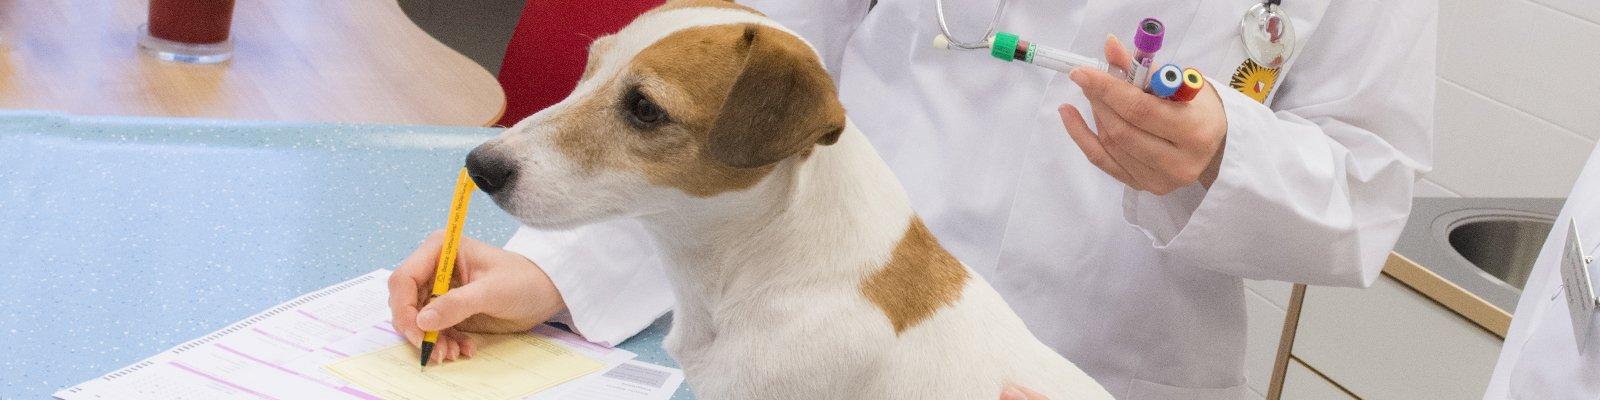 Veterinaire services en samenwerking, diergeneeskunde